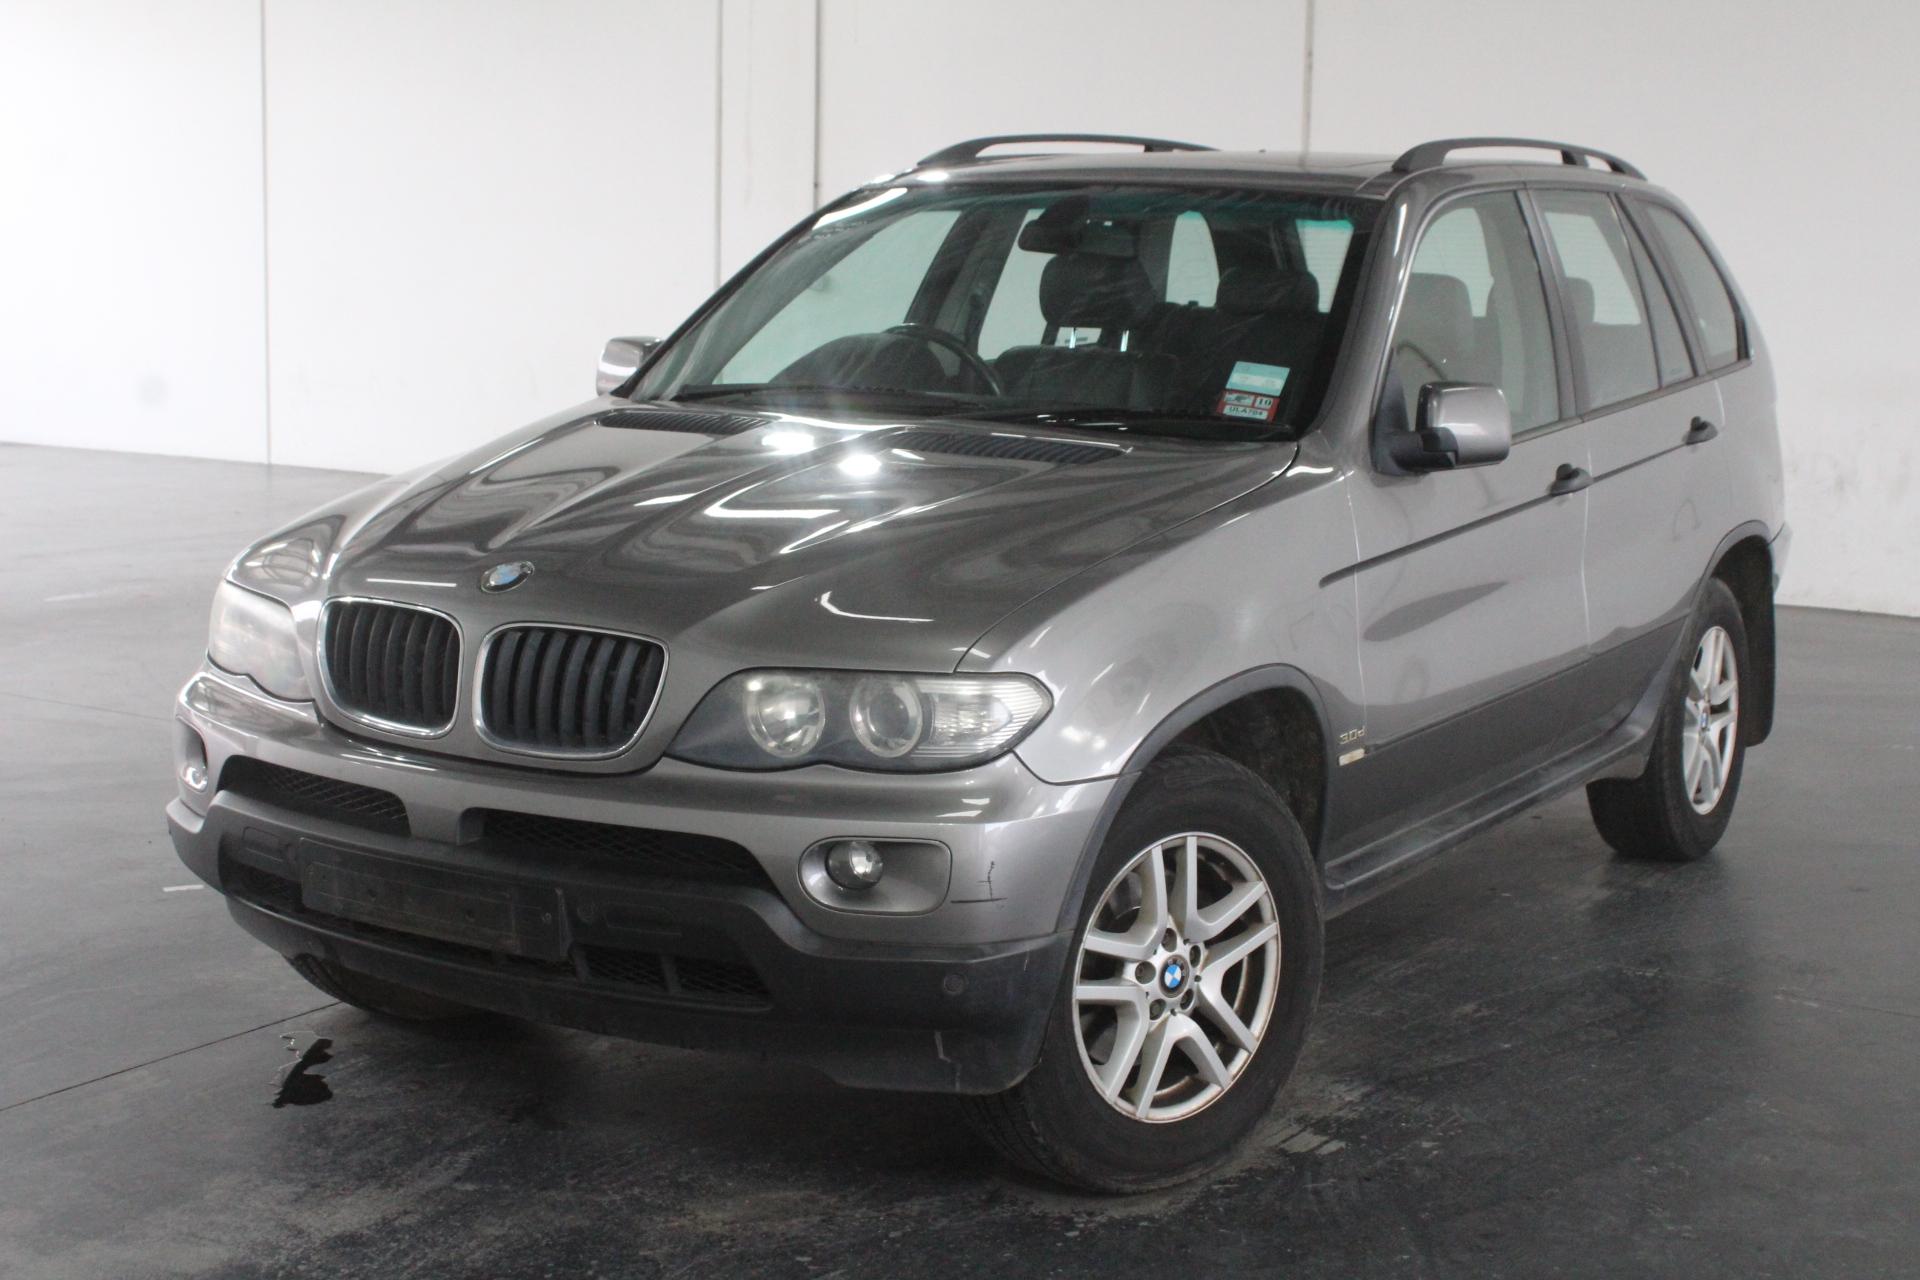 2006 BMW X5 3.0d E53 Turbo Diesel Automatic Wagon